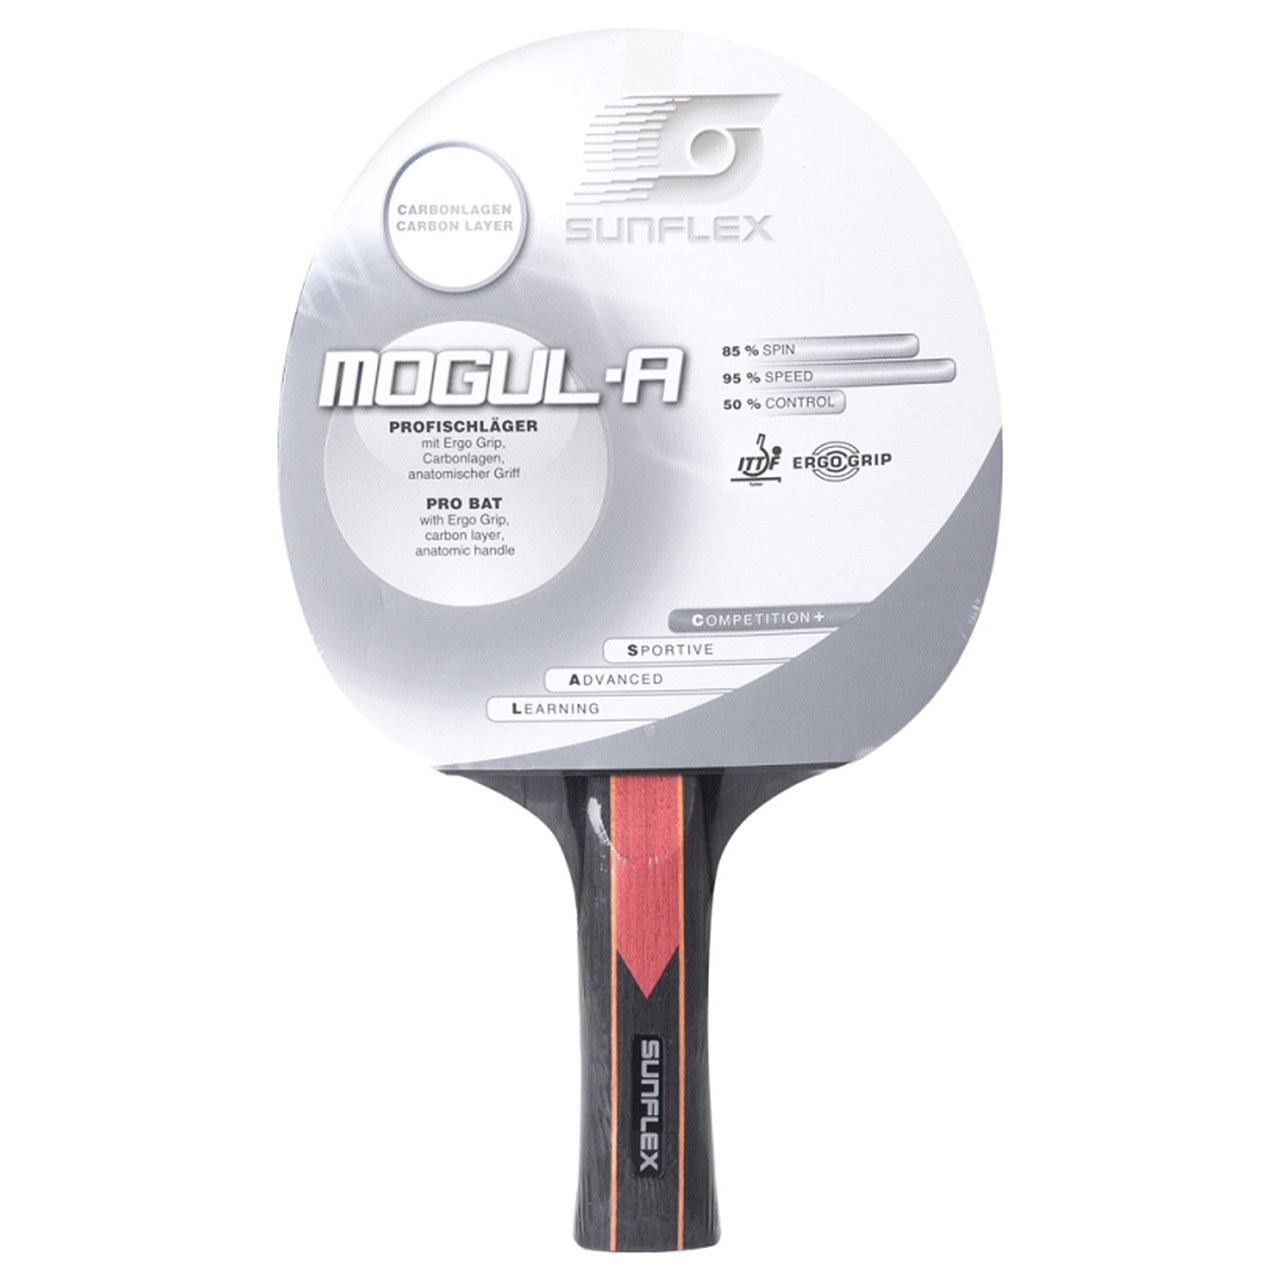 راکت پينگ پنگ سان فلکس مدل Mogul-A Level 1000 | Sunflex Mogul-A Level 1000 Ping Pong Racket